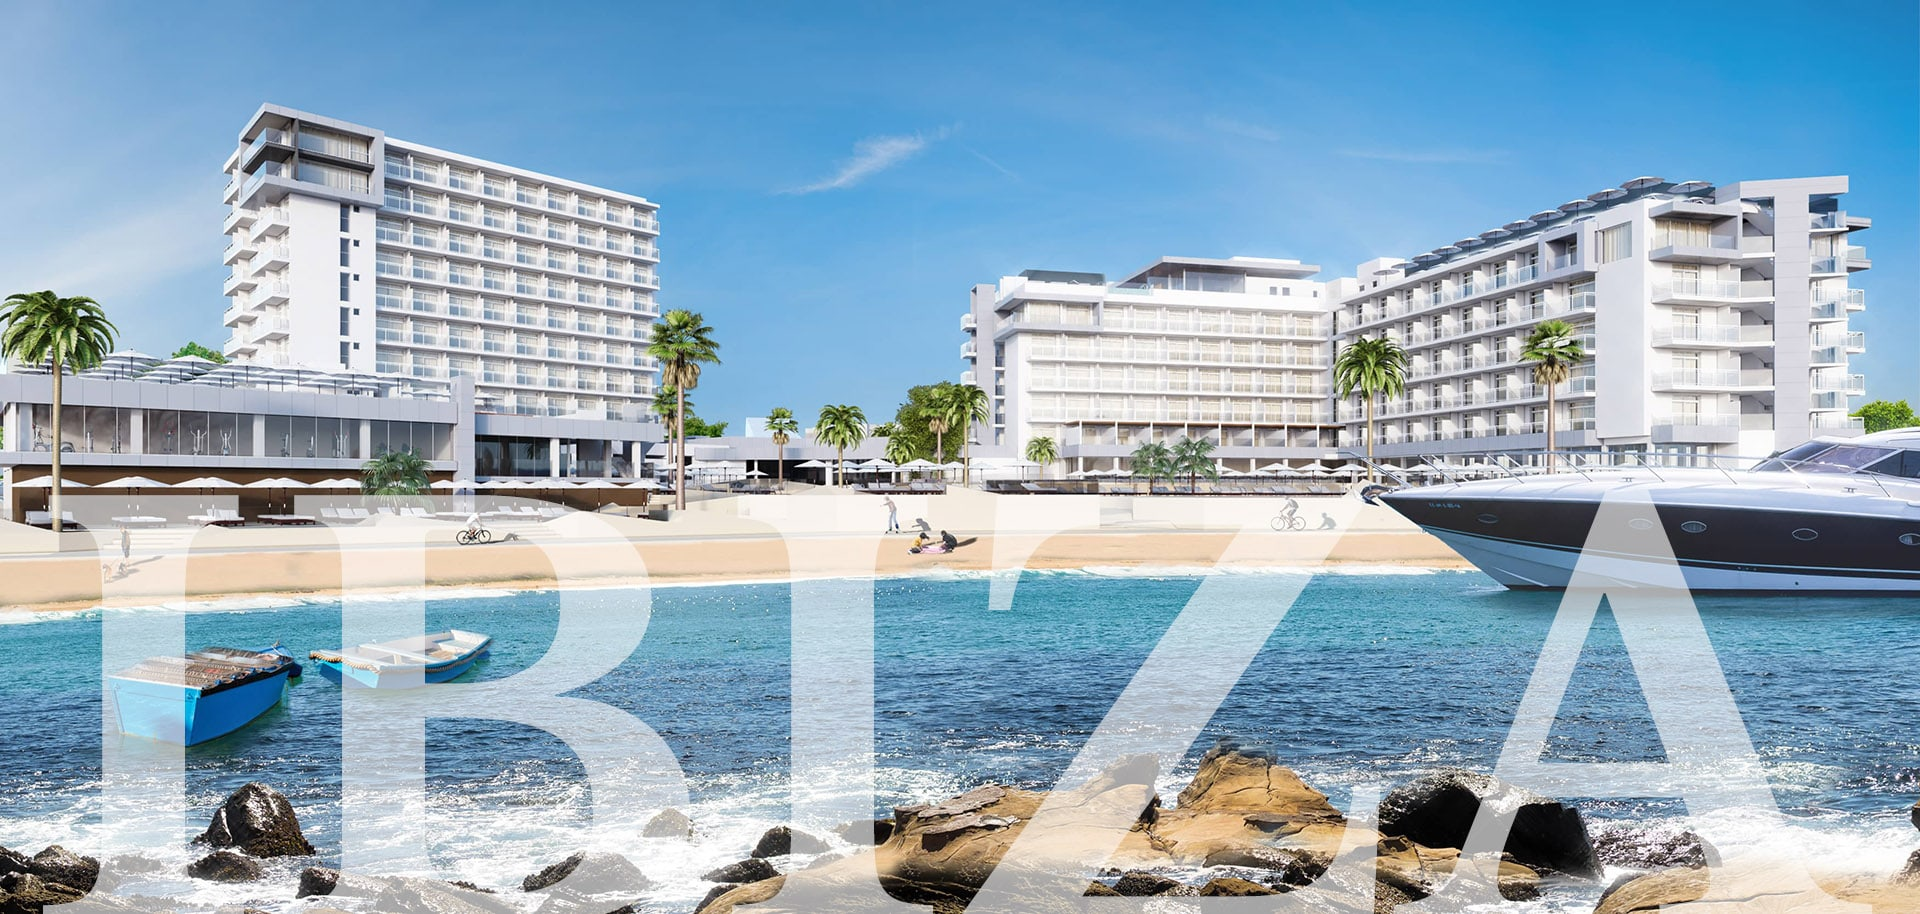 Amàre Beach Hotel Ibiza - San Antonio bay hotel Ibiza